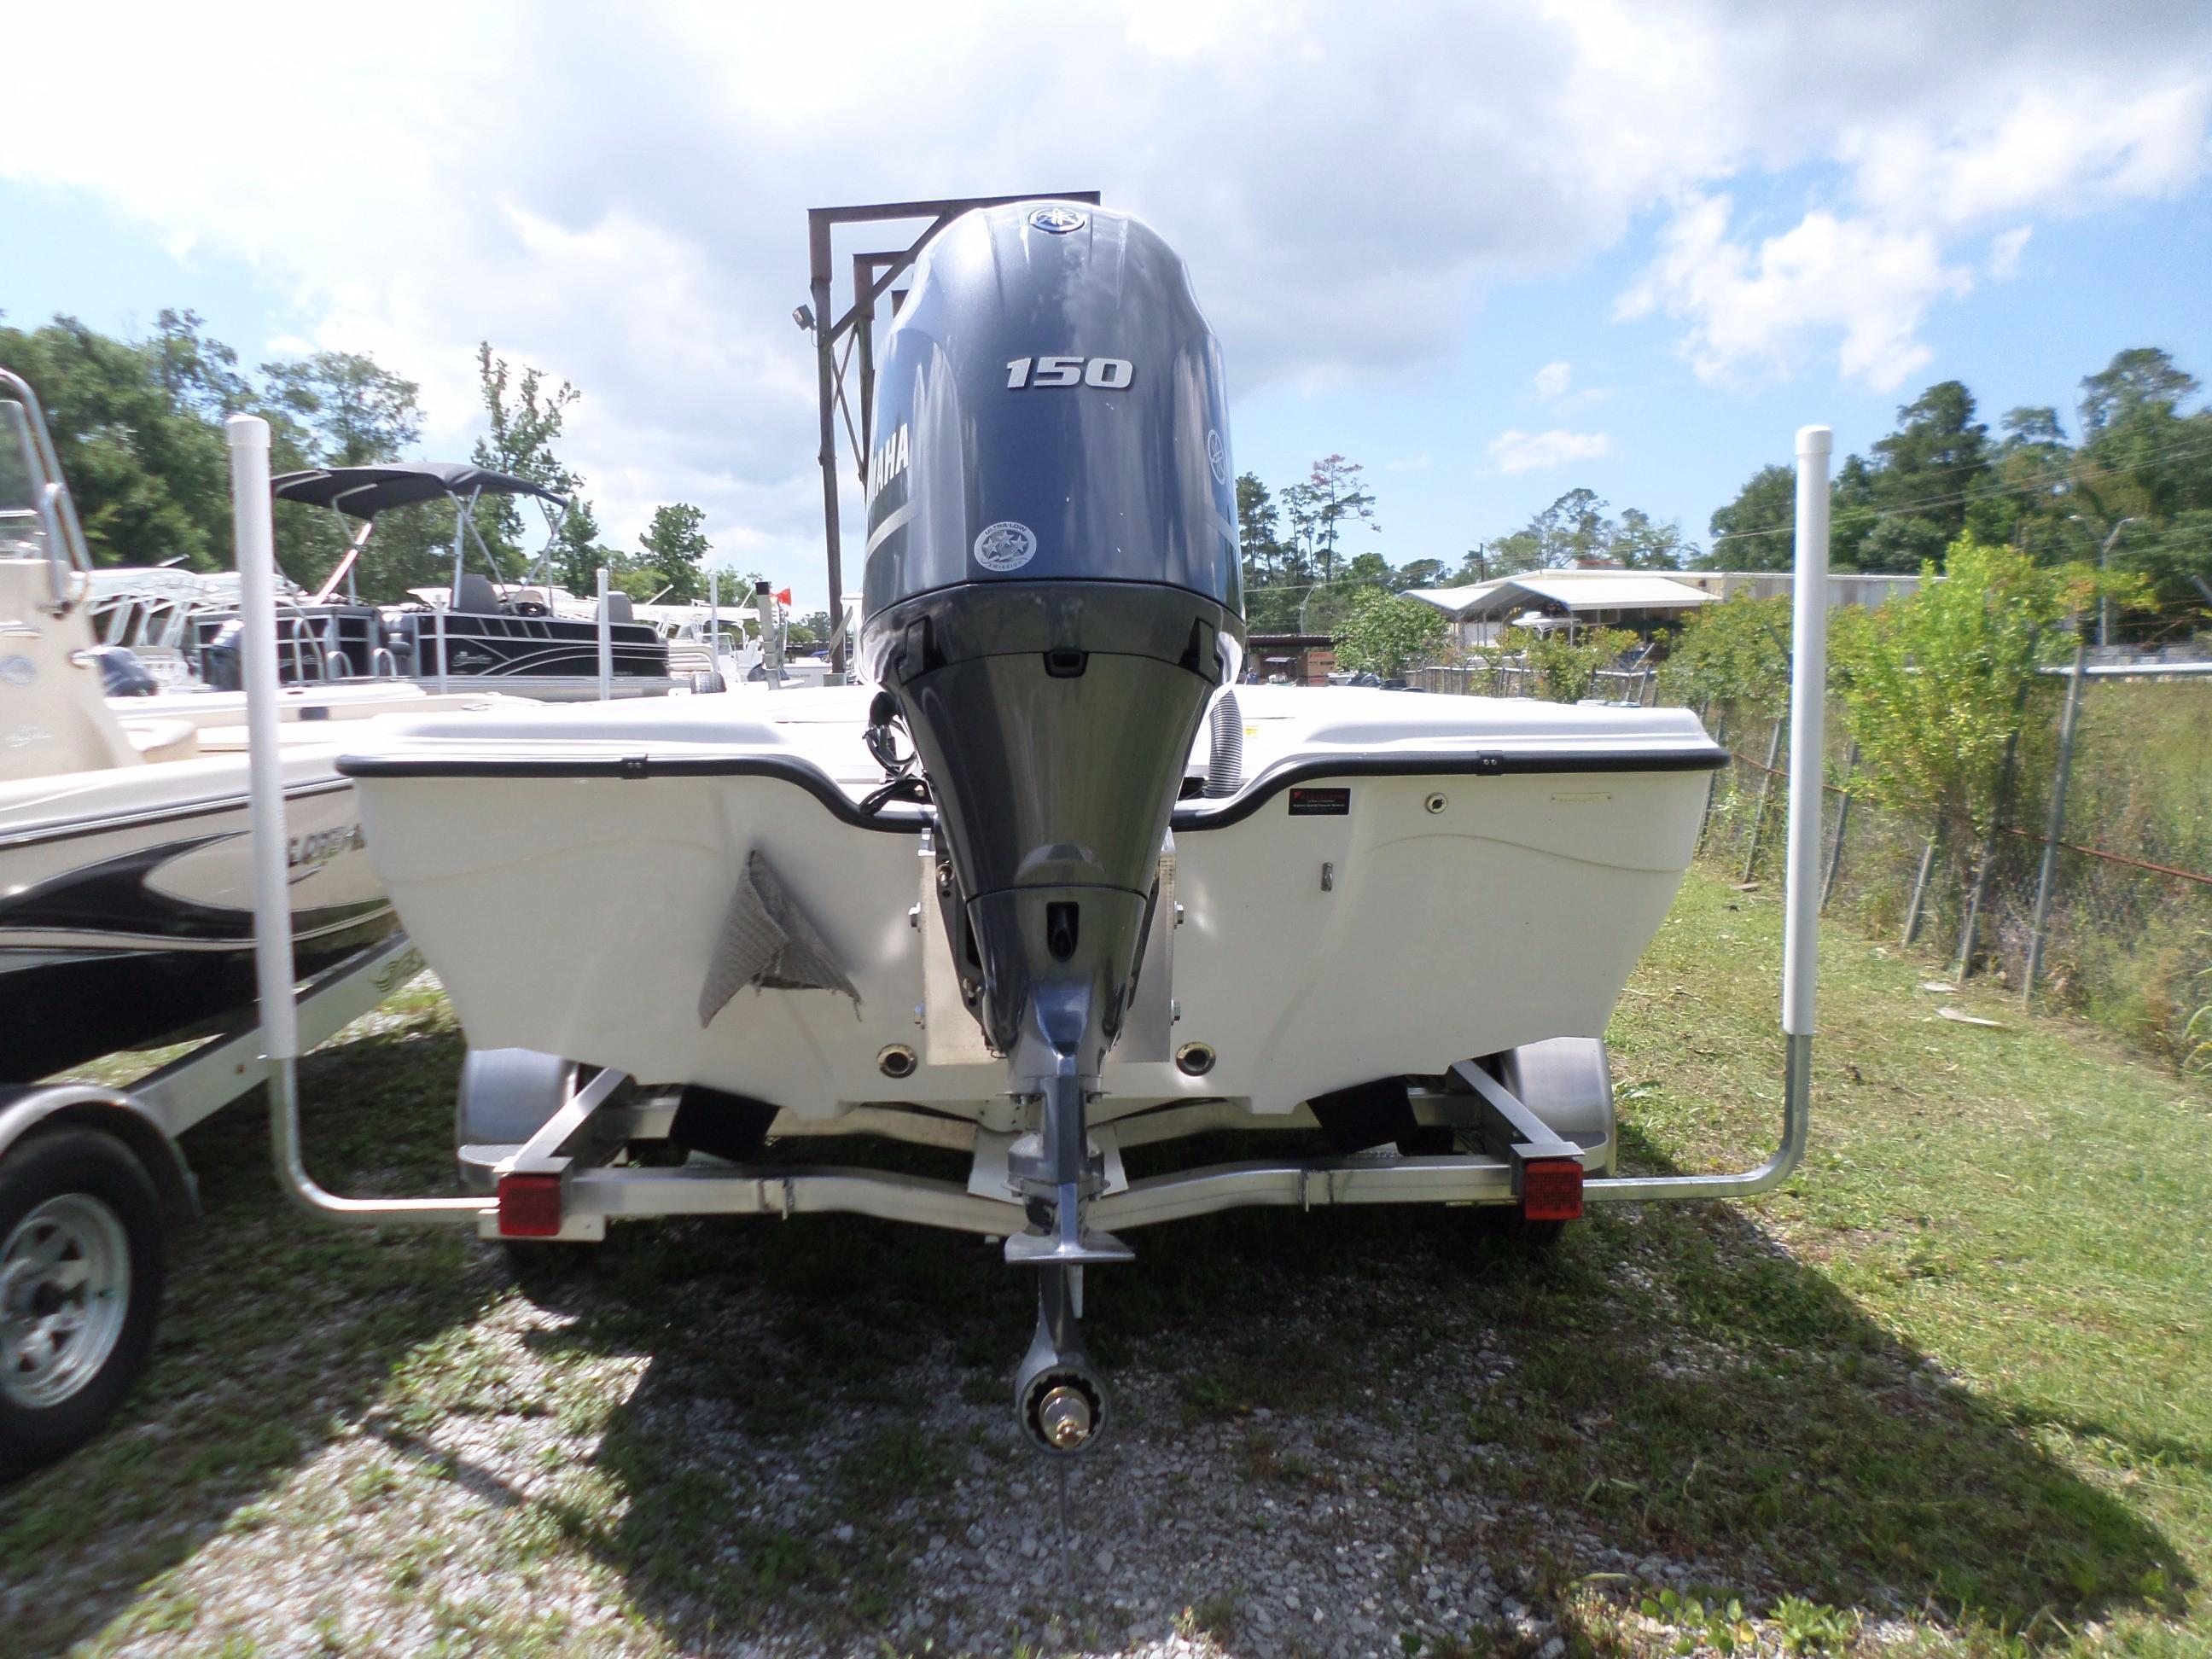 New  2017 22' Blue Wave 22 SL Bay Boat in Slidell, Louisiana